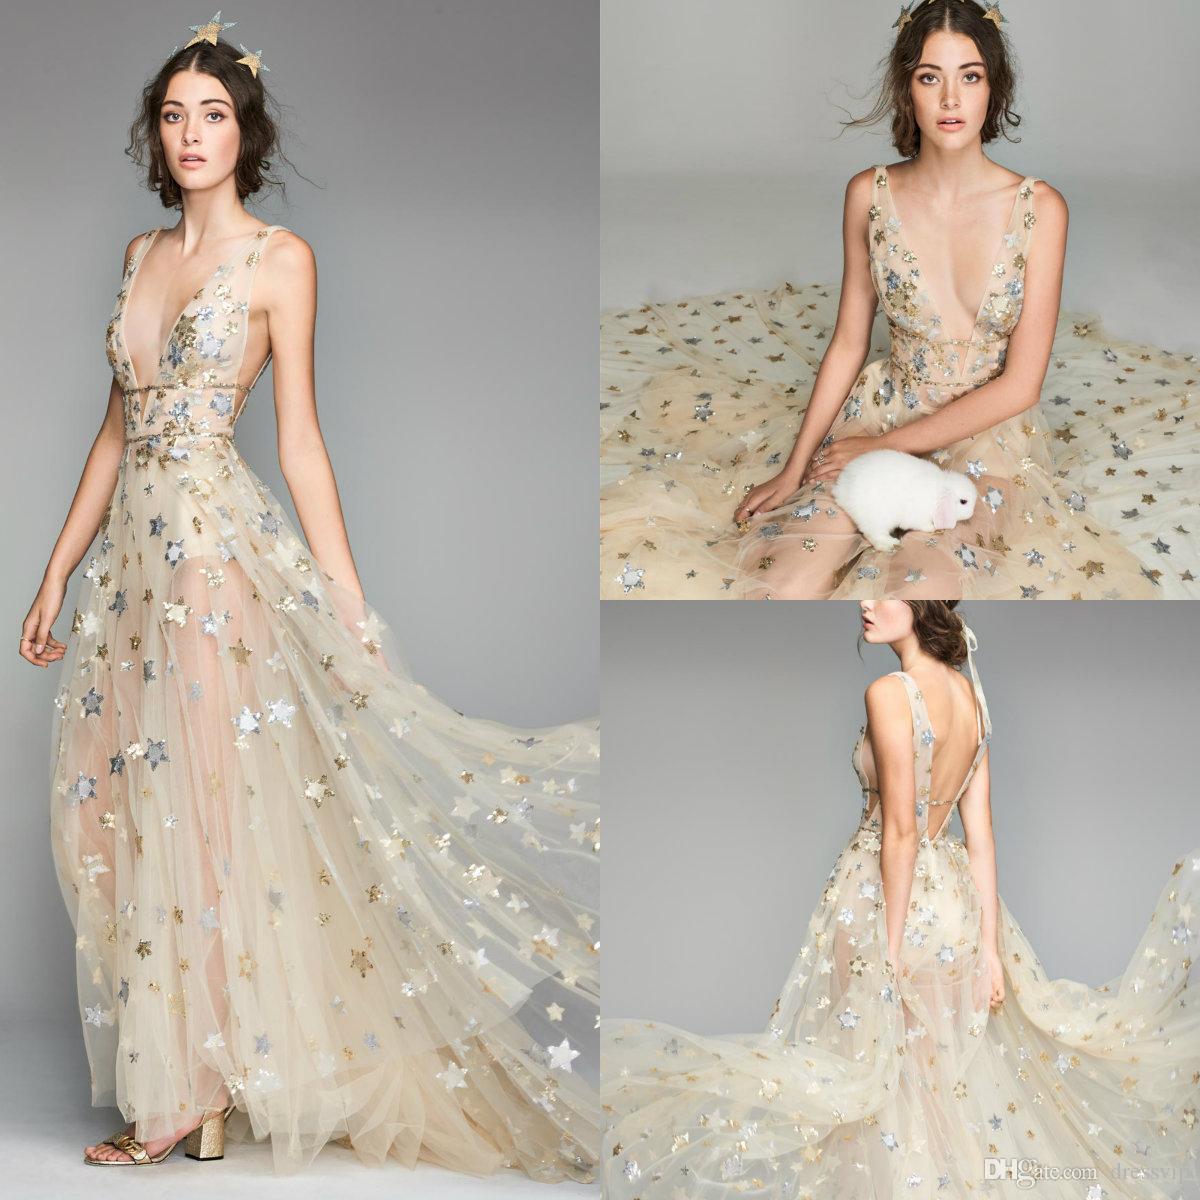 57cb7c695fd33 2018 Fairy Prom Dresses Bling Star Deep V Neck Sweep Train Sleeveless  Formal Dress Party Evening Robes De Soirée Plus Size Evening Gown Unique  Prom Dresses ...